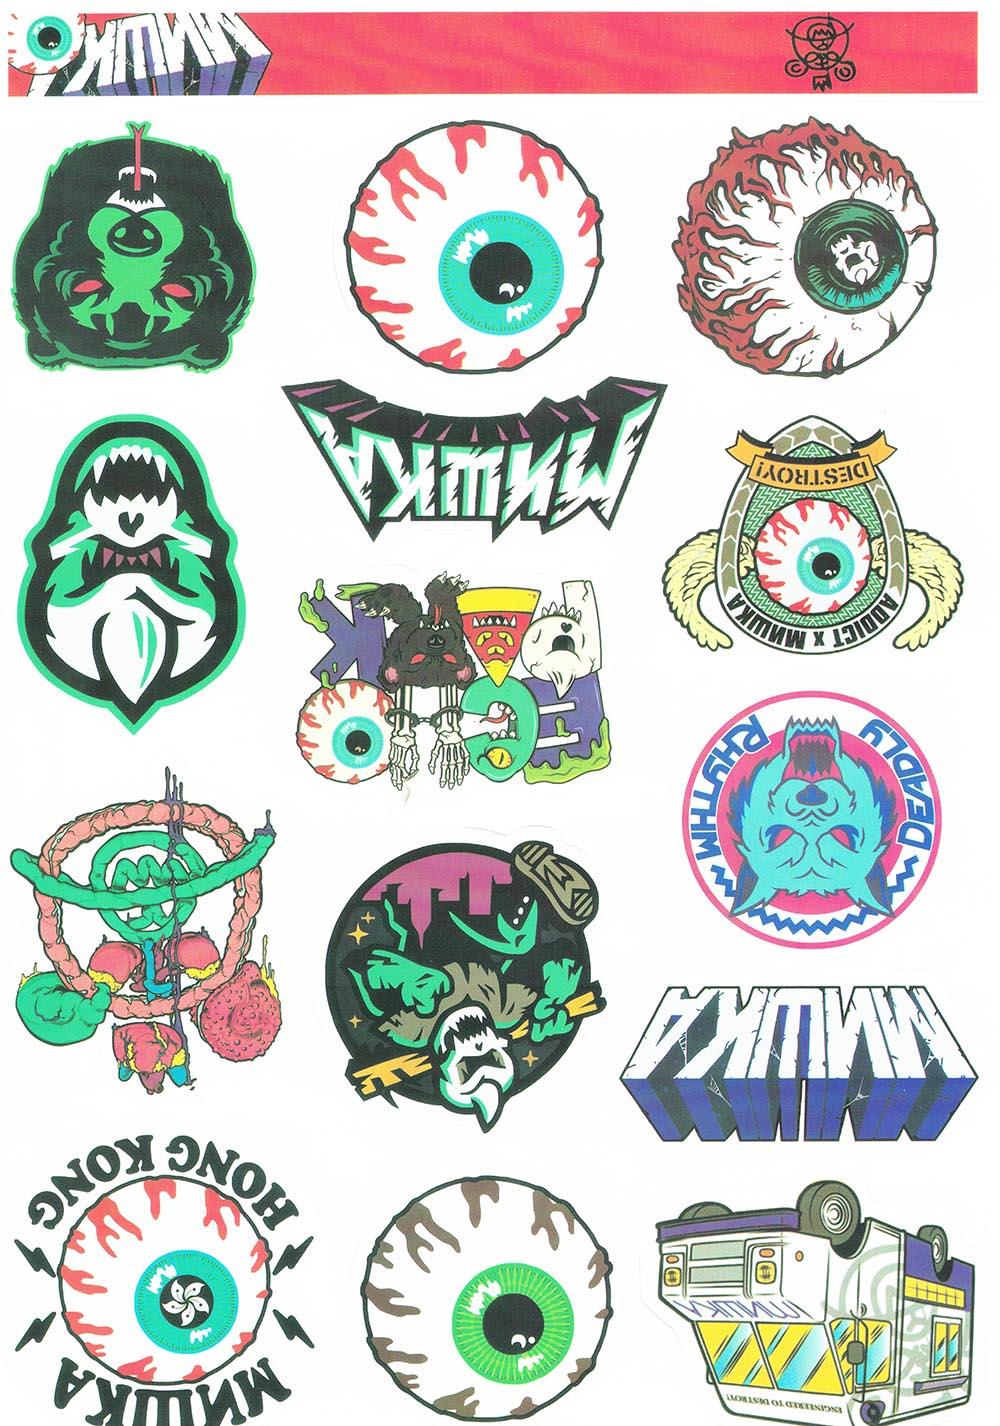 Hiphop Style Eye Pattern PVC Waterproof Laptop Phone Stickers For Tablet Macbook Pro Iphone Ipad Sticker